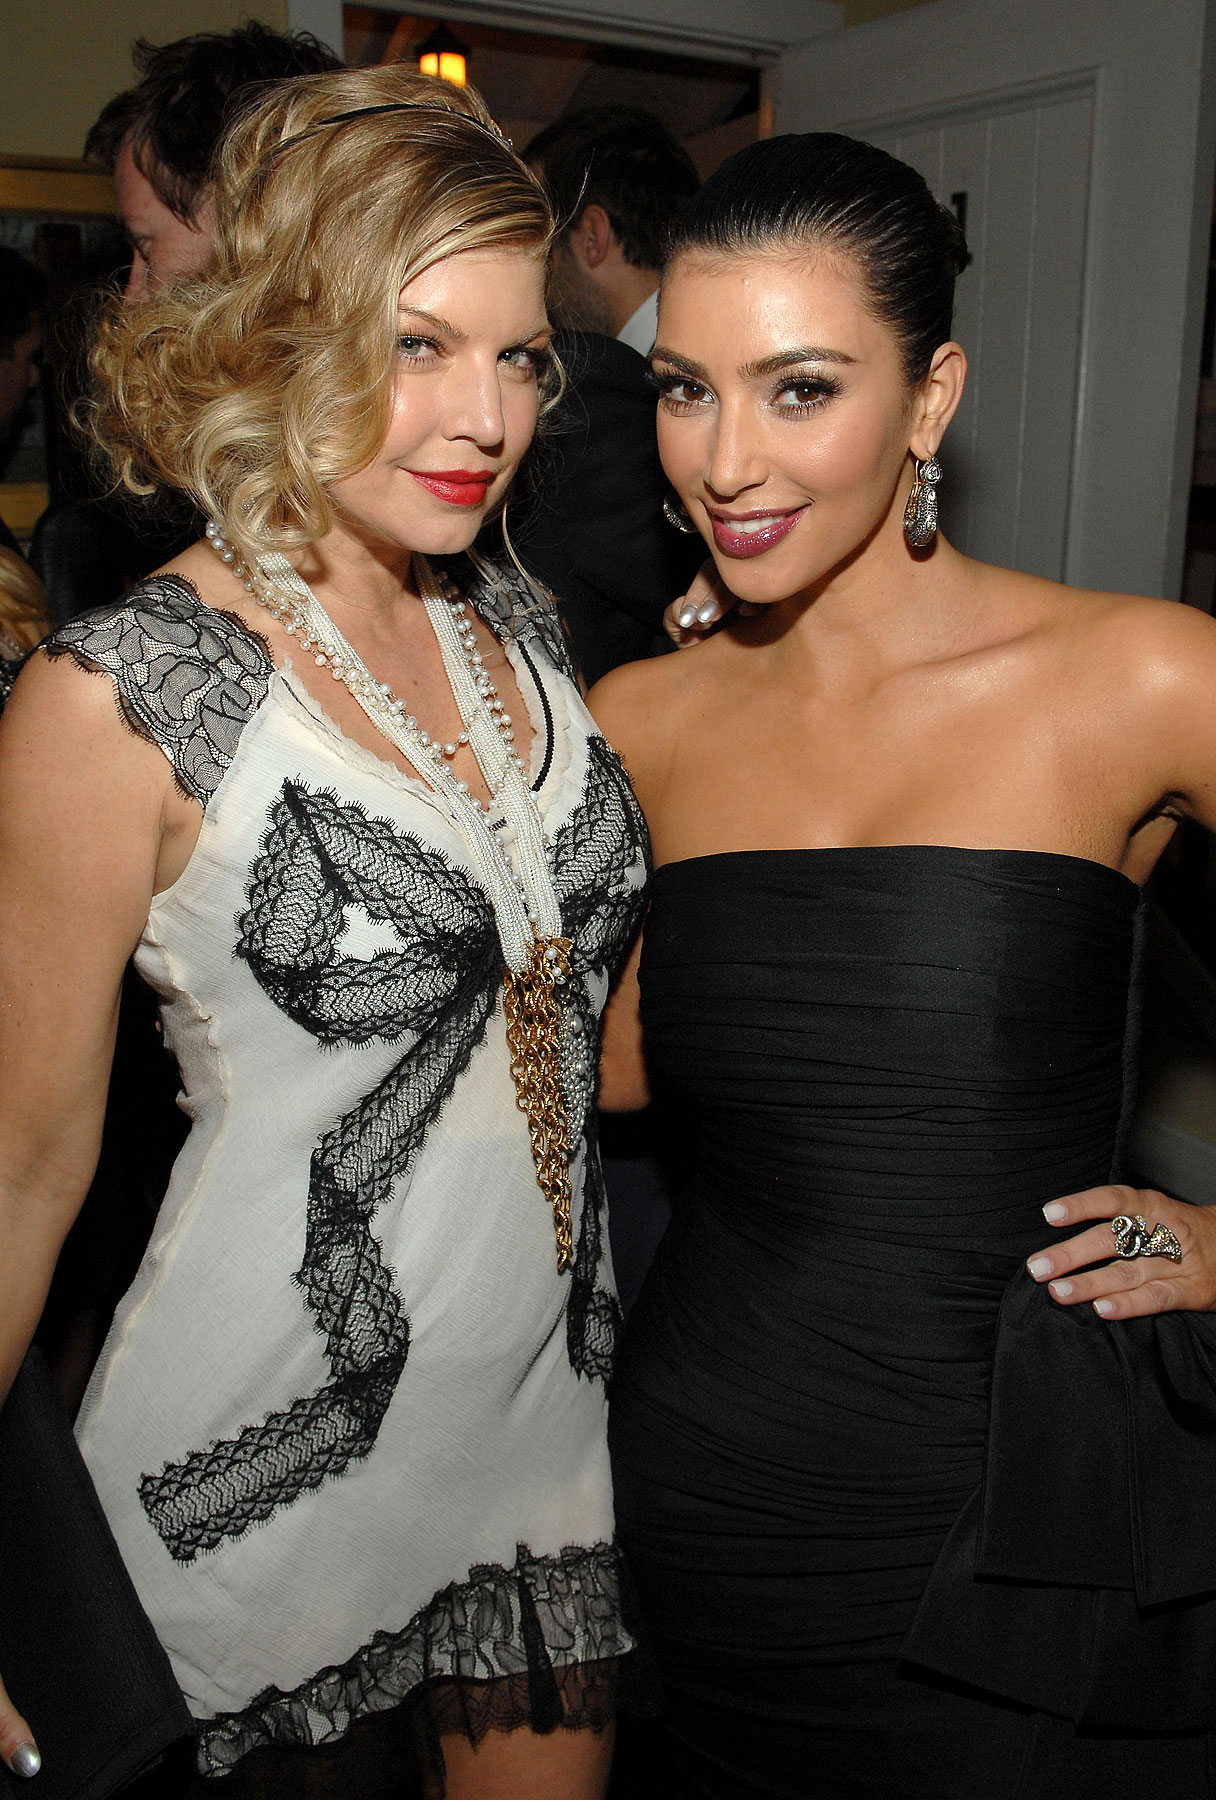 It's Fashion Love, Not War, For Kardashian & Fergie